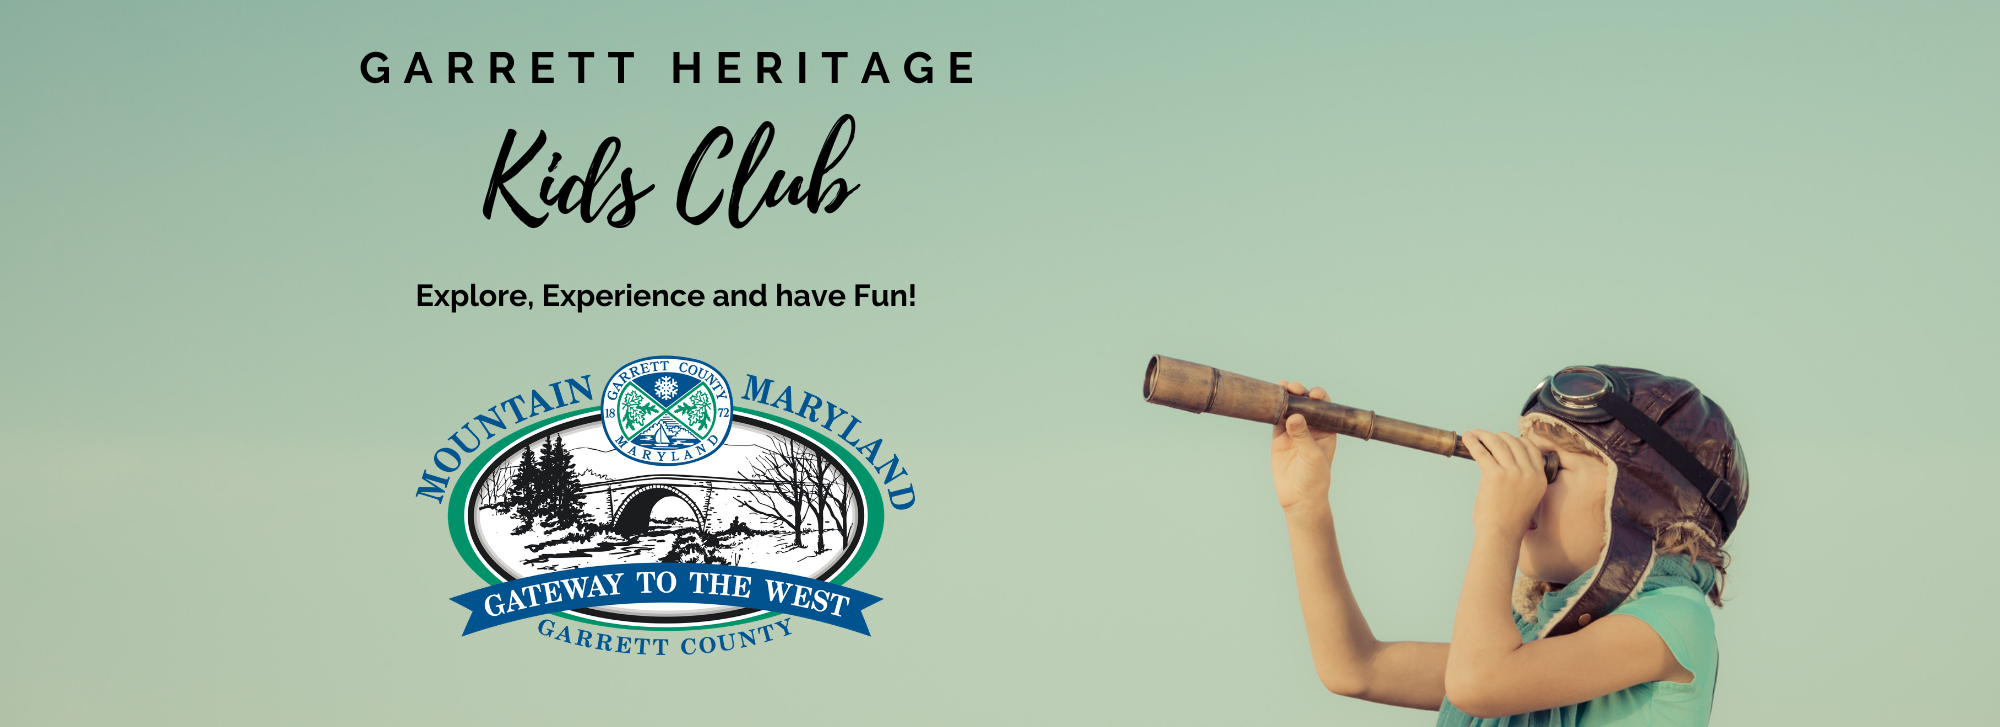 Garrett-Heritage-Kids-Club-Banner-(2).png